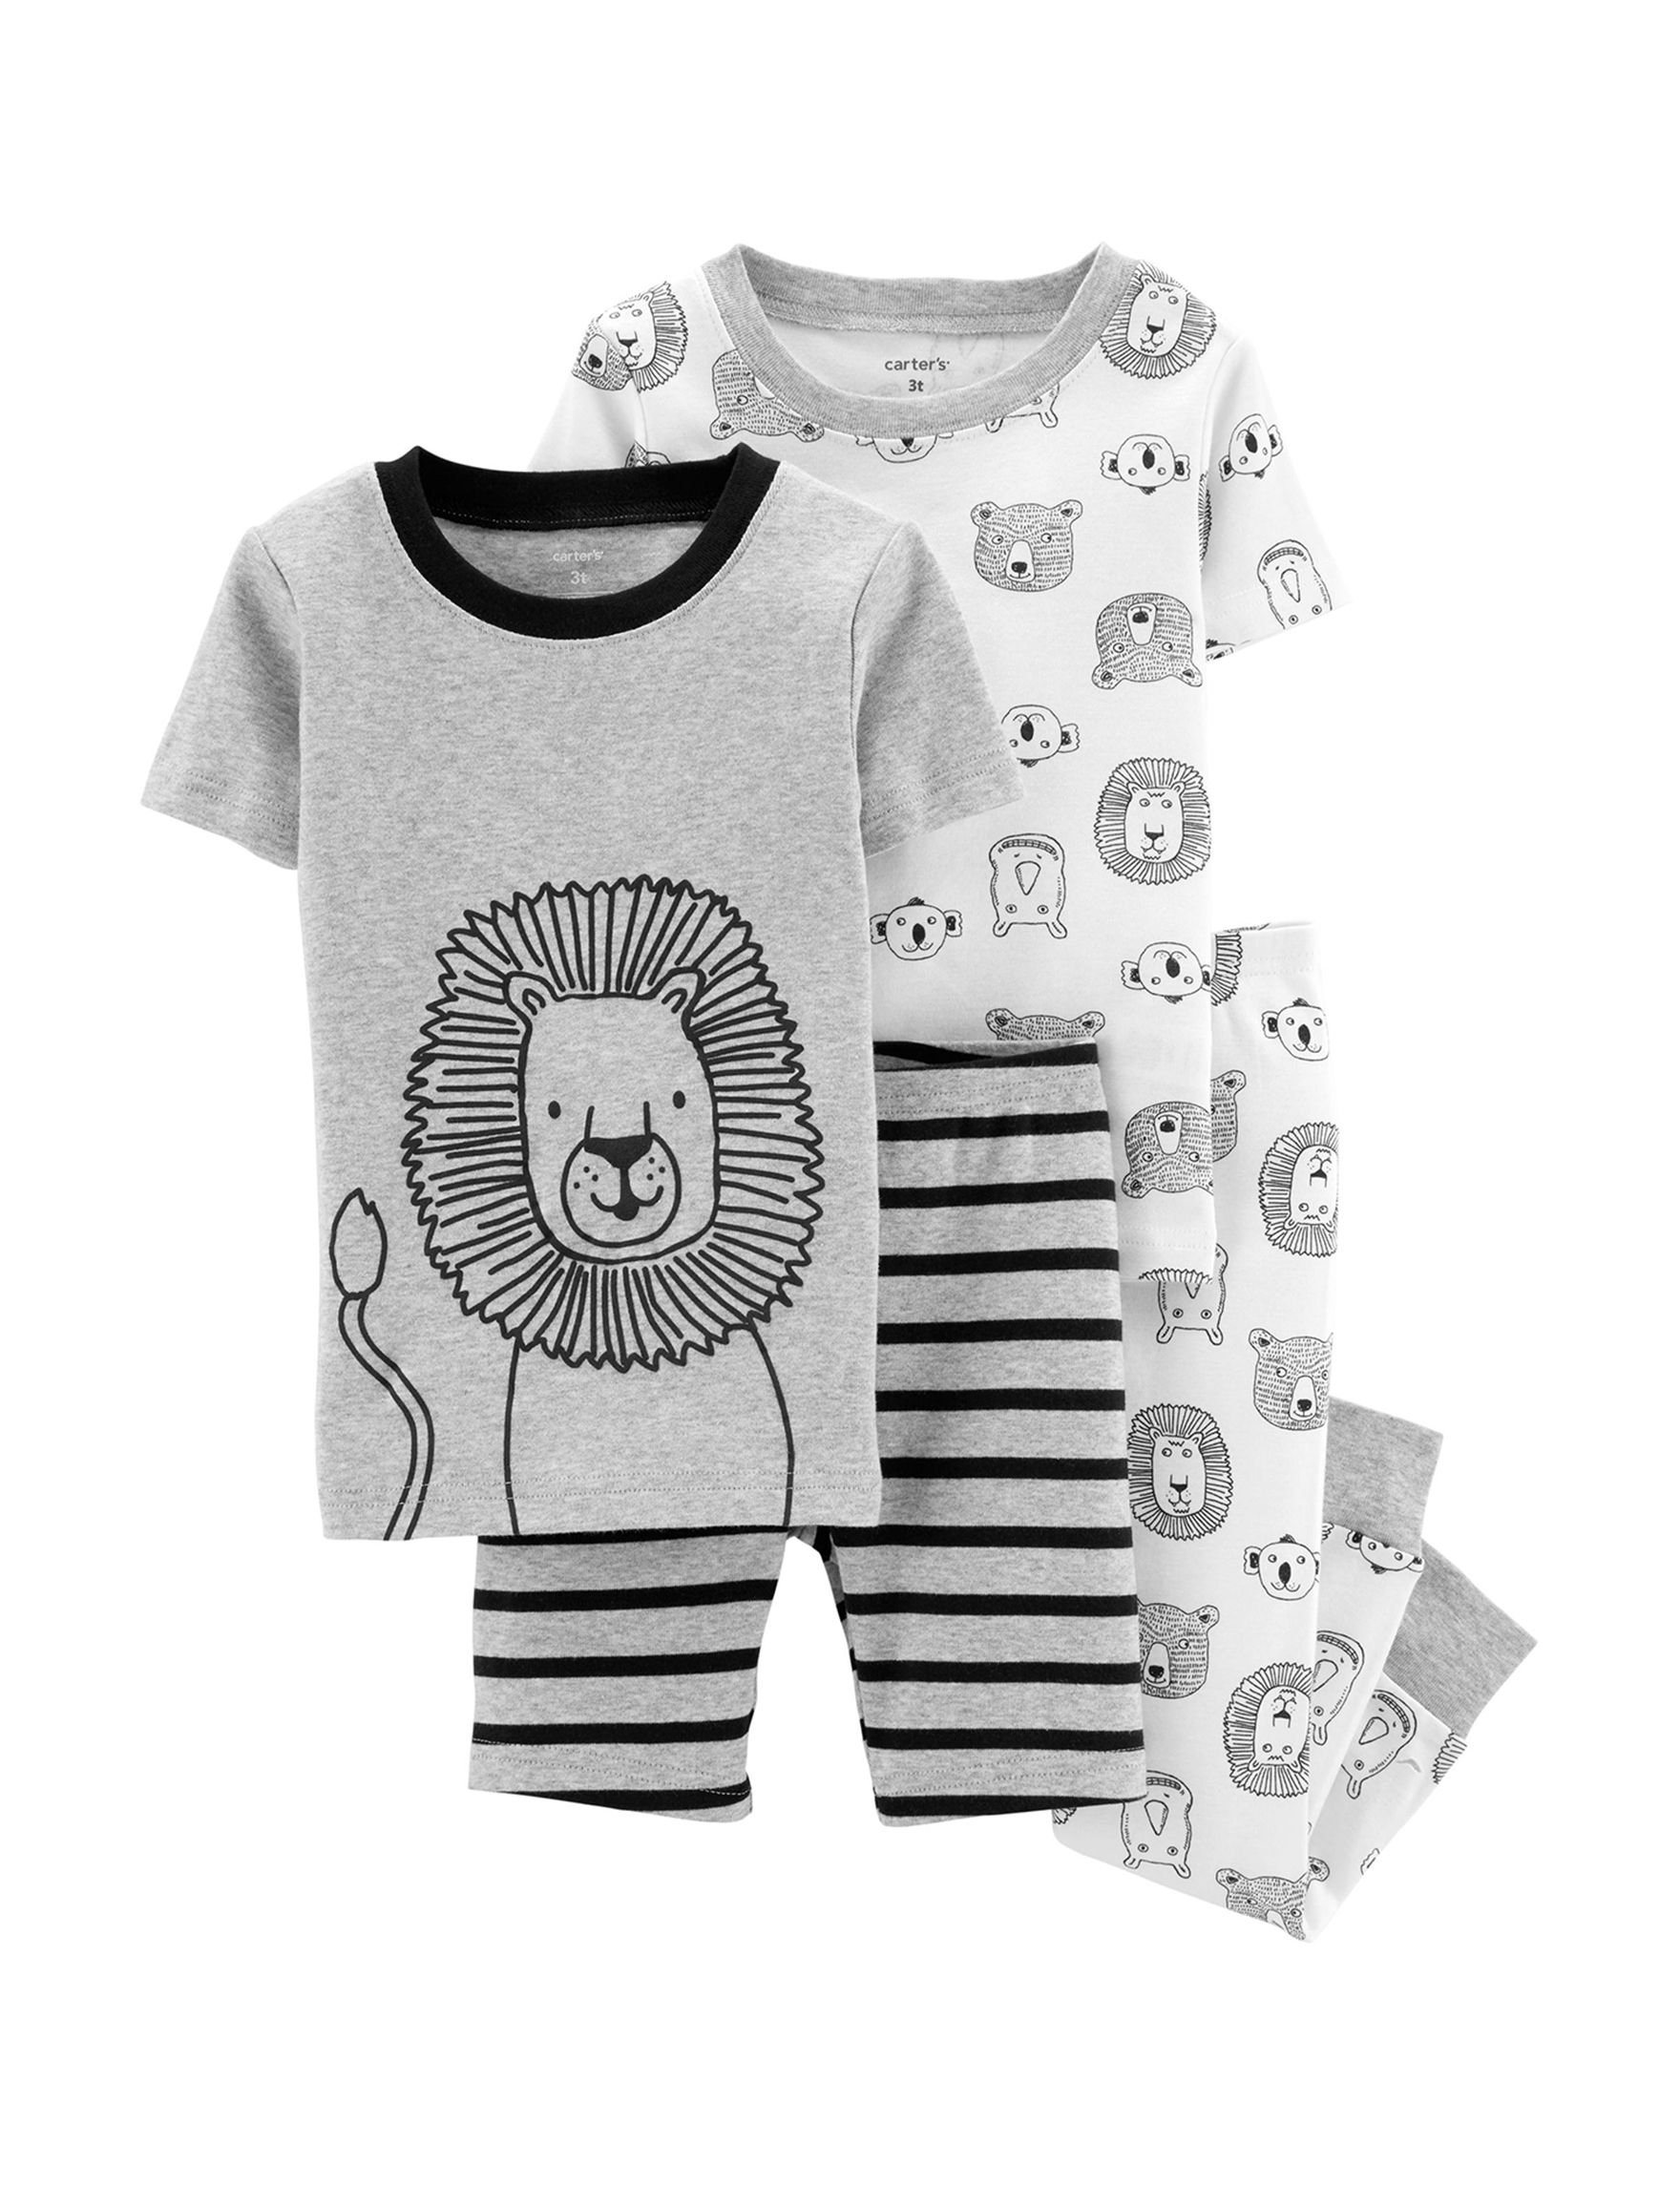 Carter's Grey / White Pajama Sets